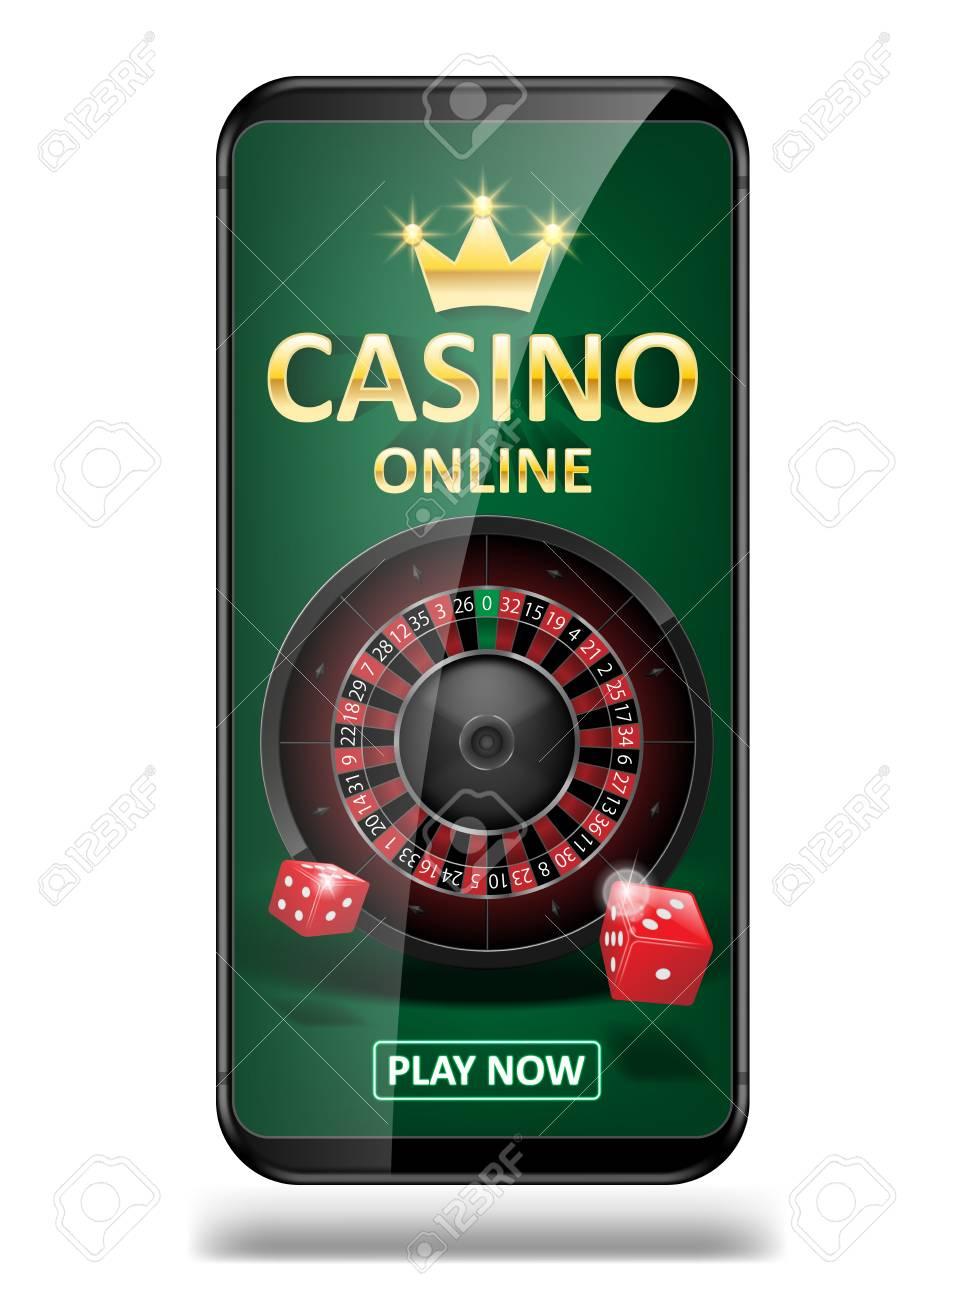 Marketing internet casino prehistoric isle 2 arcade game